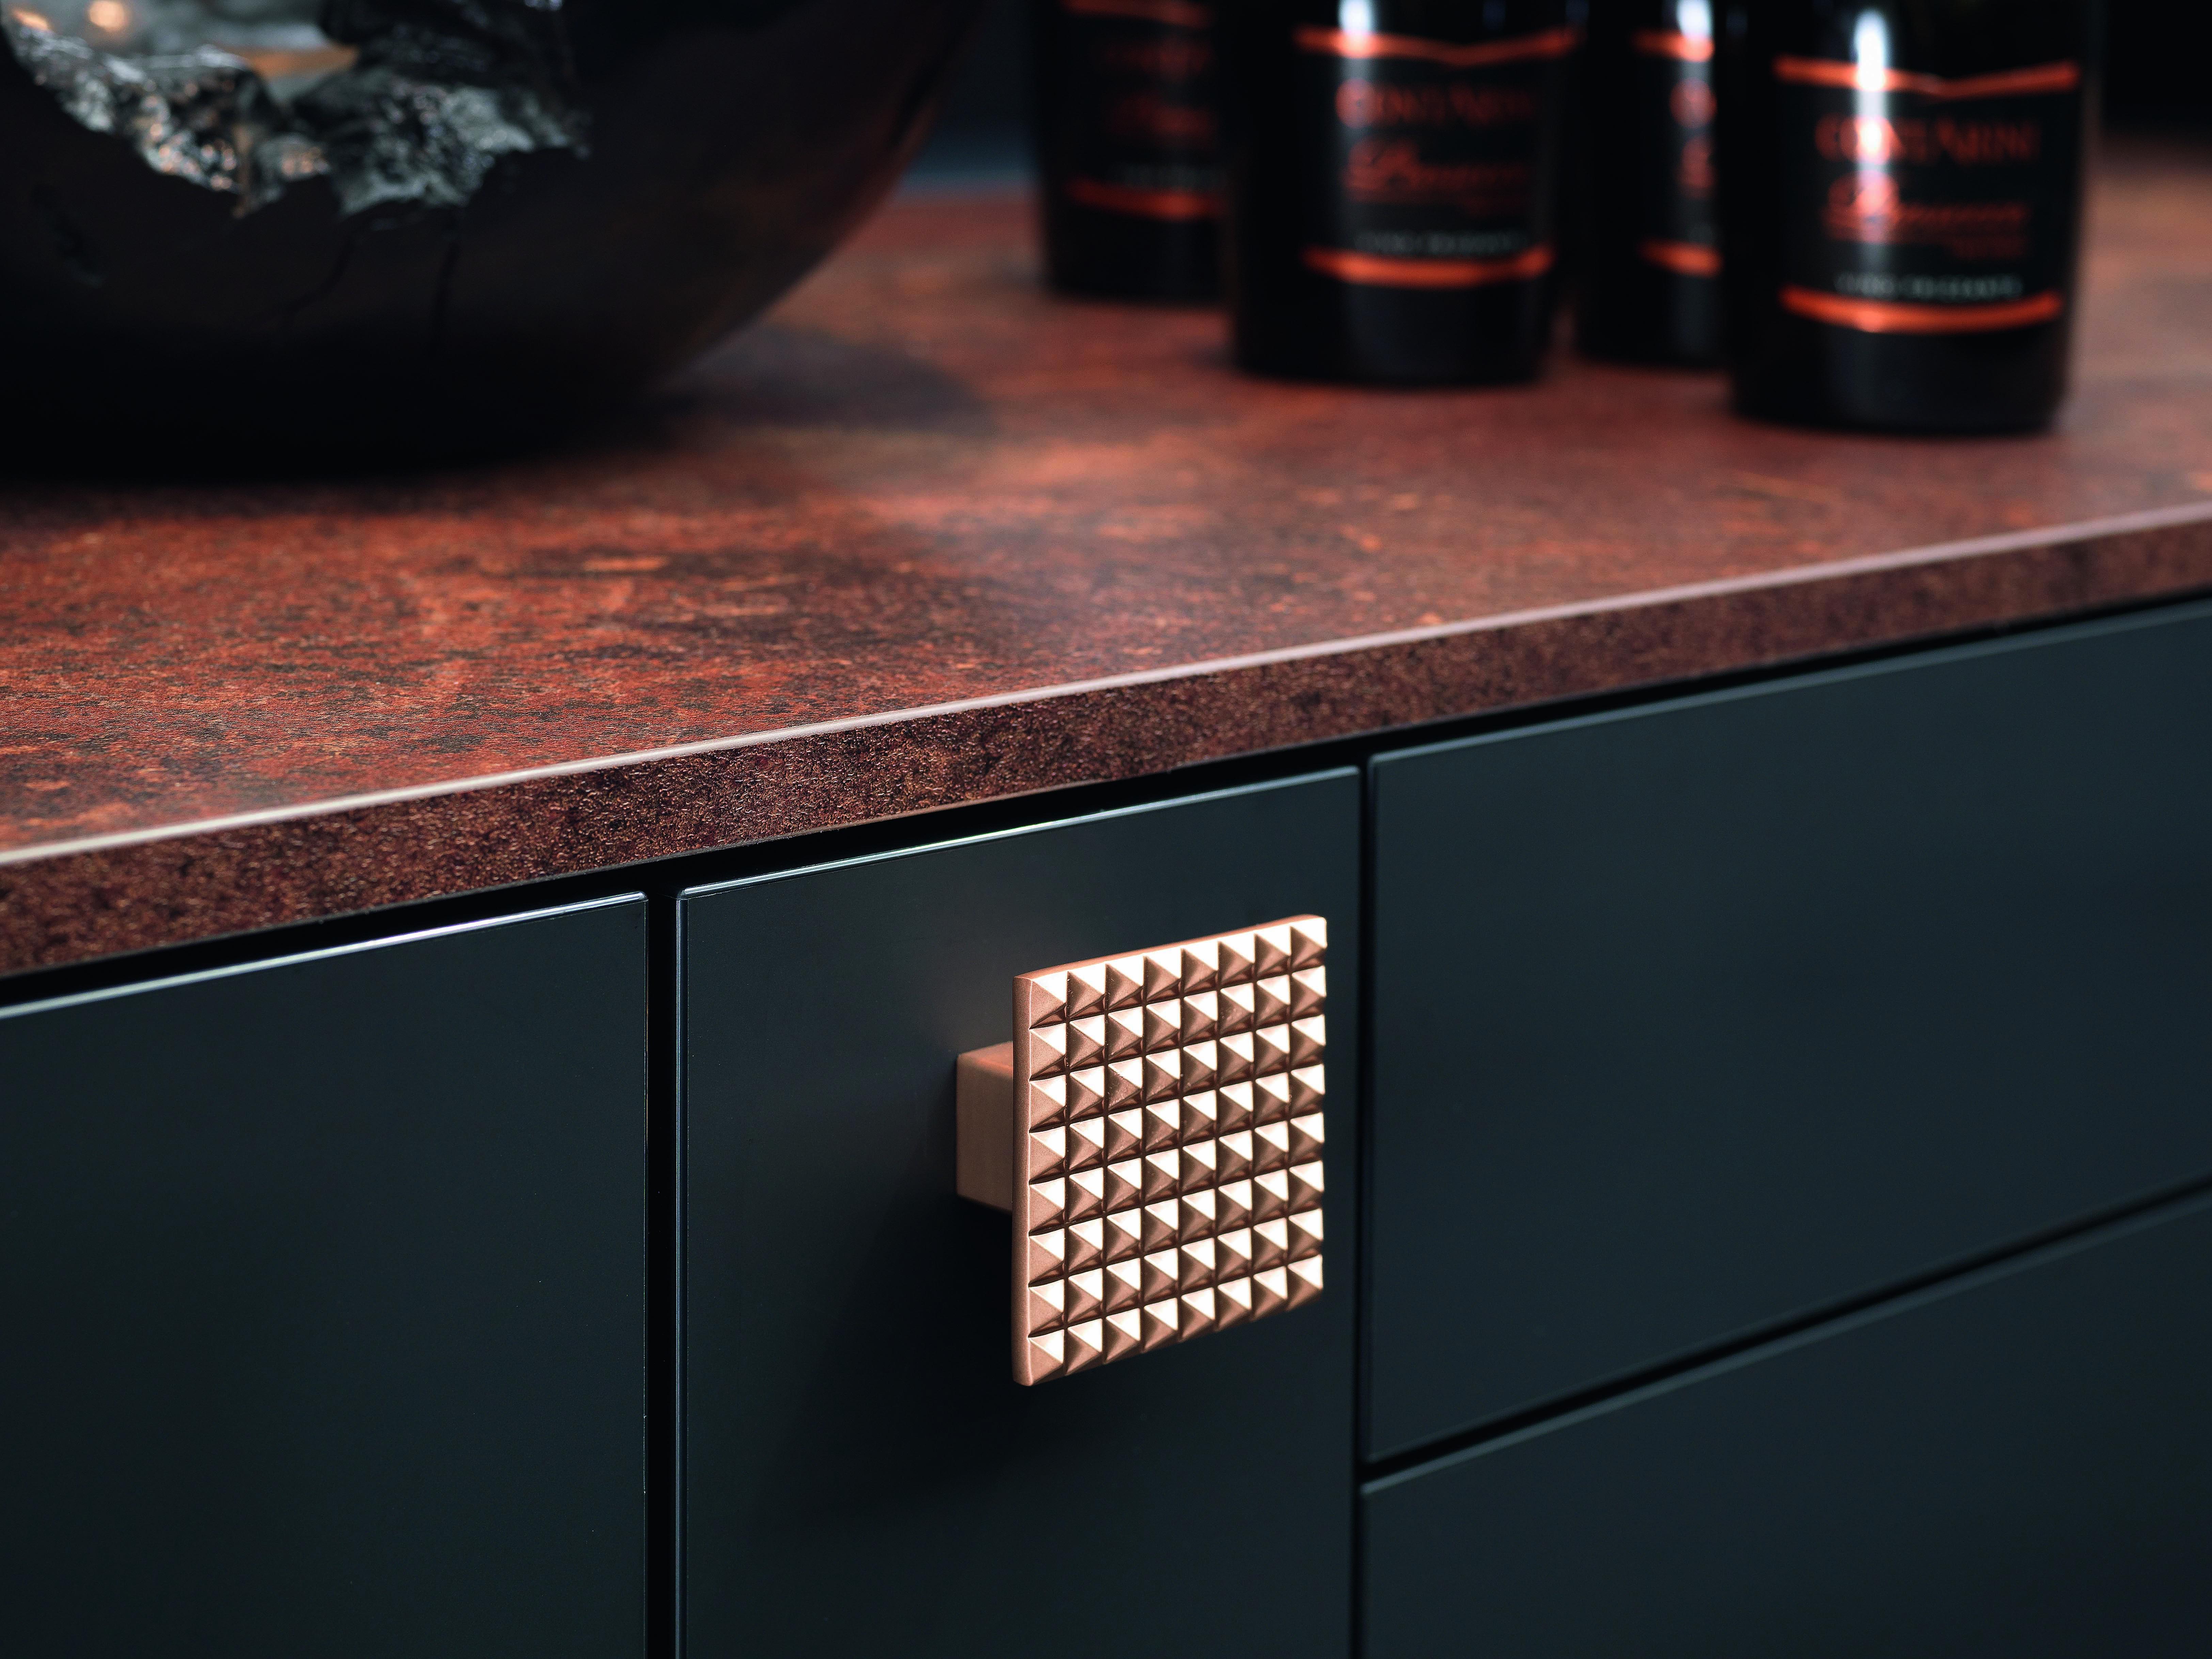 kupferküche womit man das metall kombinieren kann